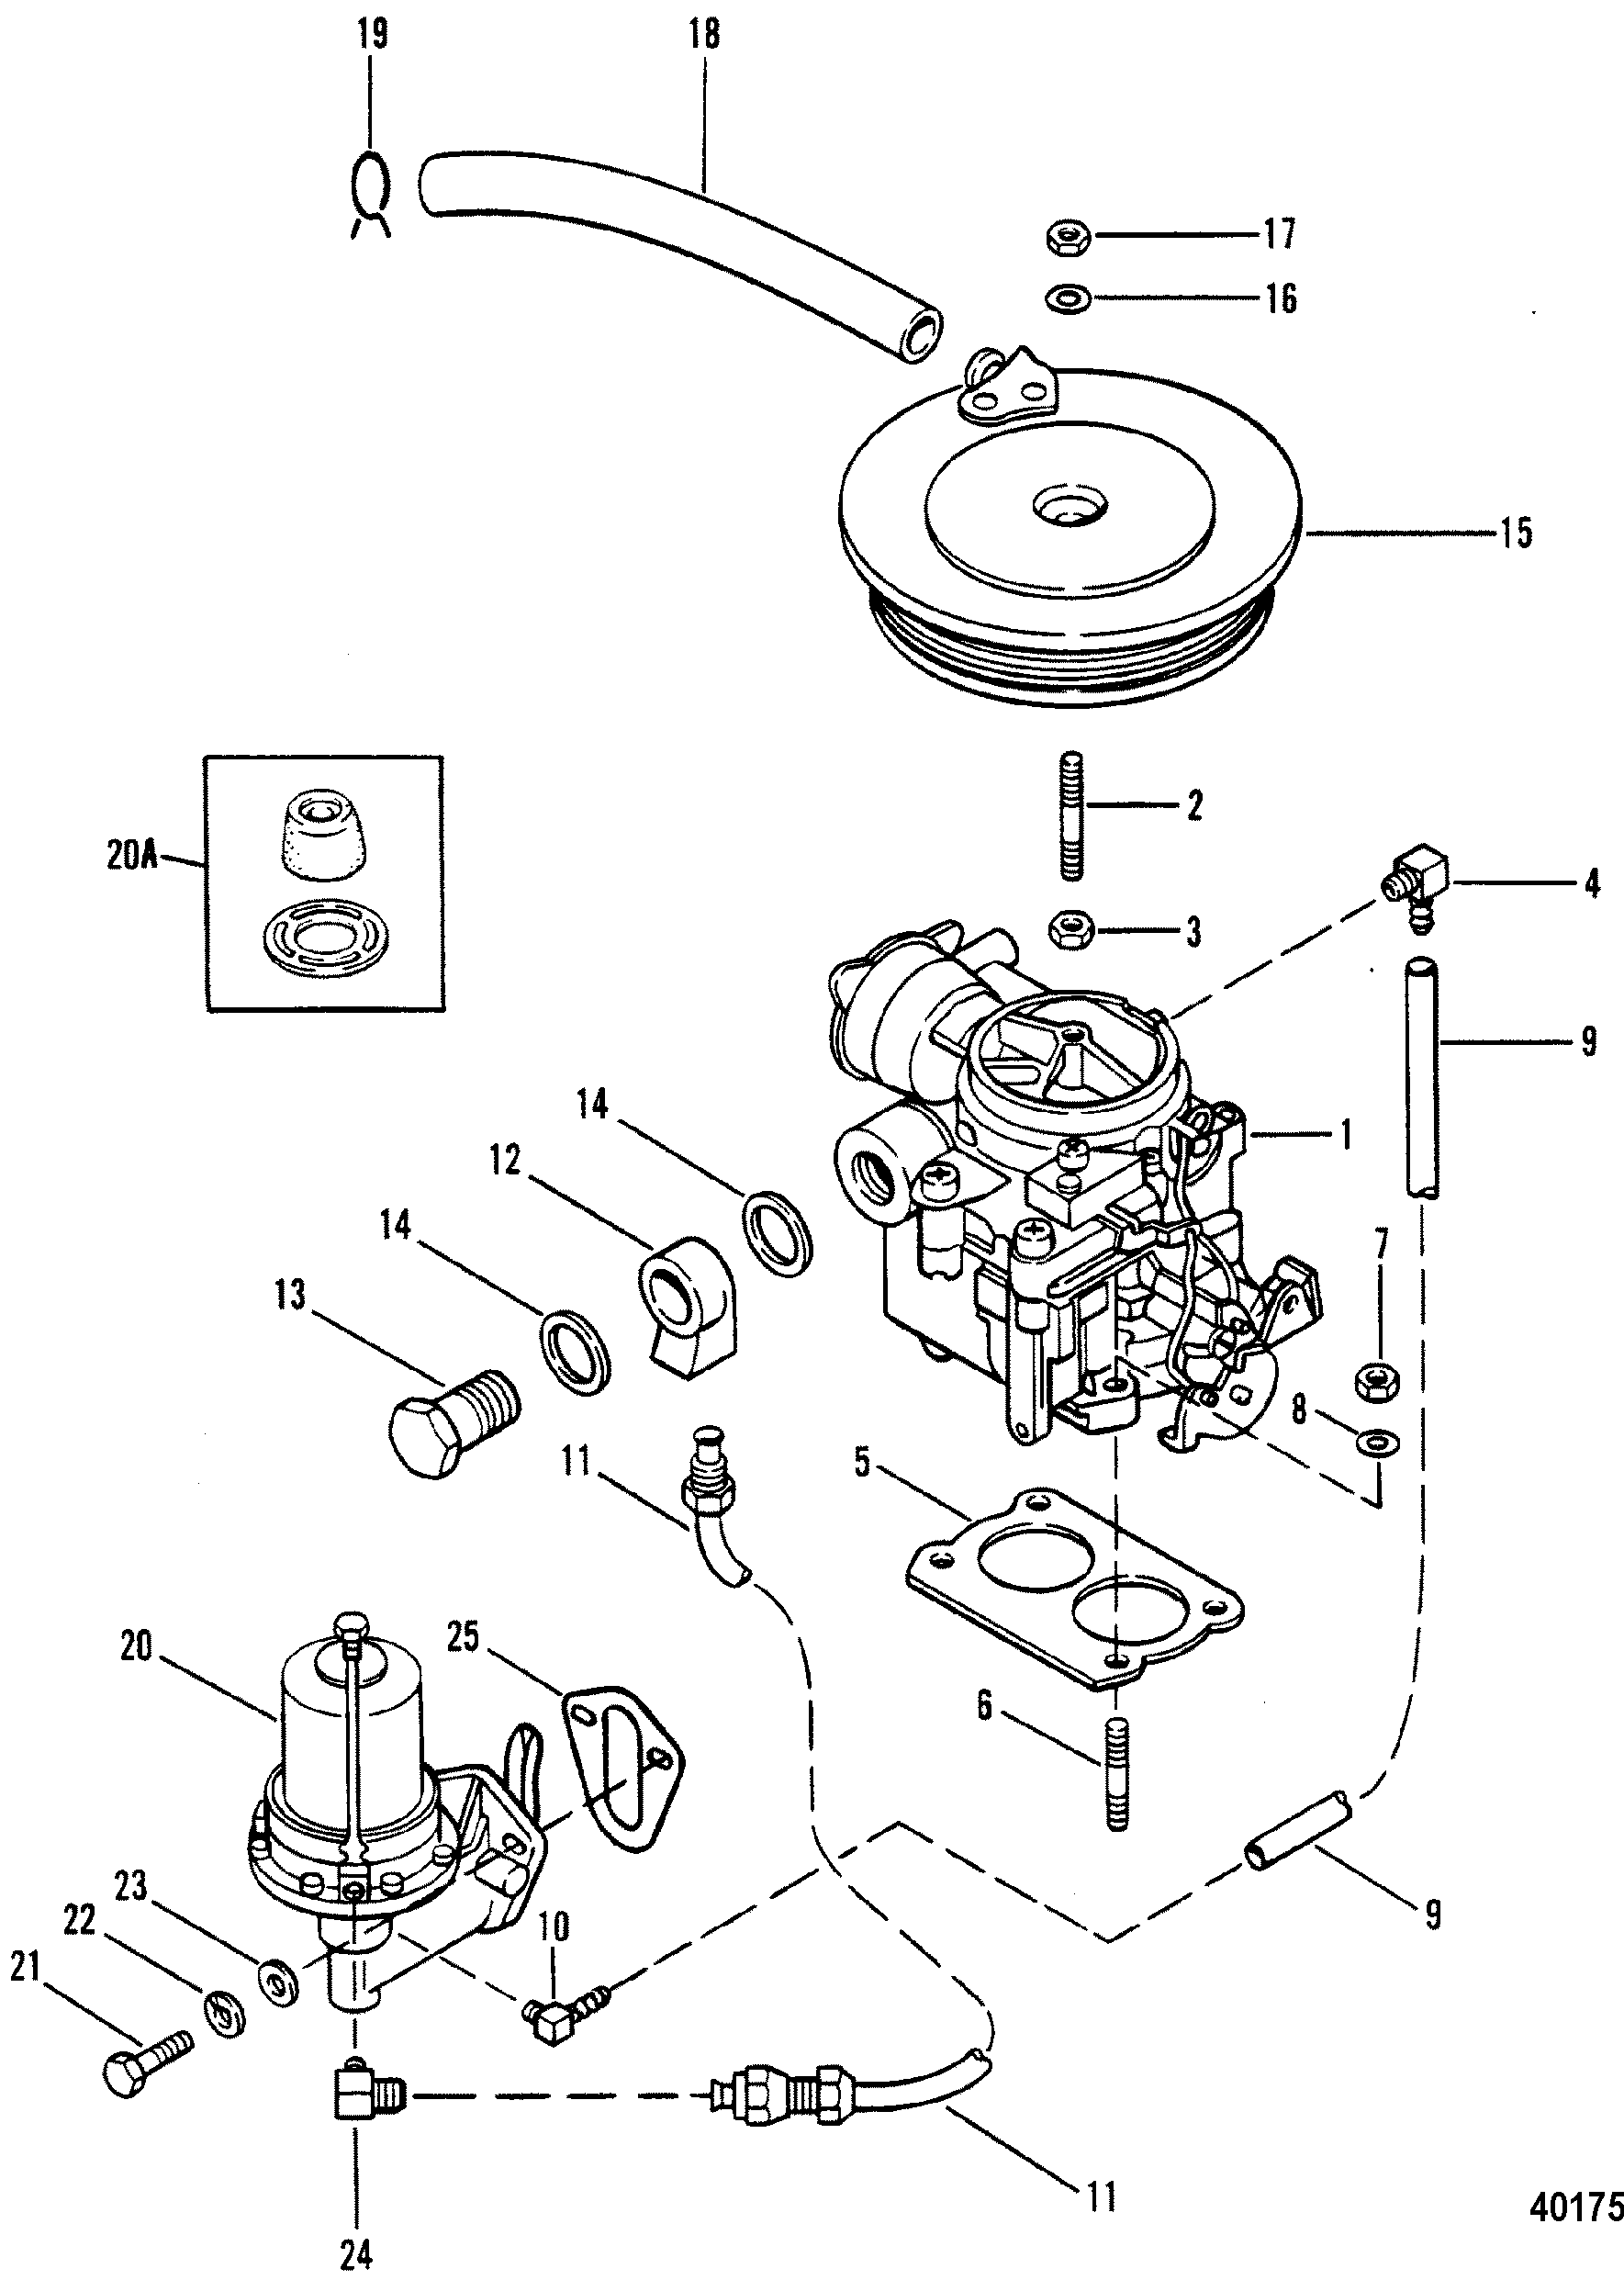 diagram of 1983 mercruiser 04707343 carburetor and fuel pump diagram